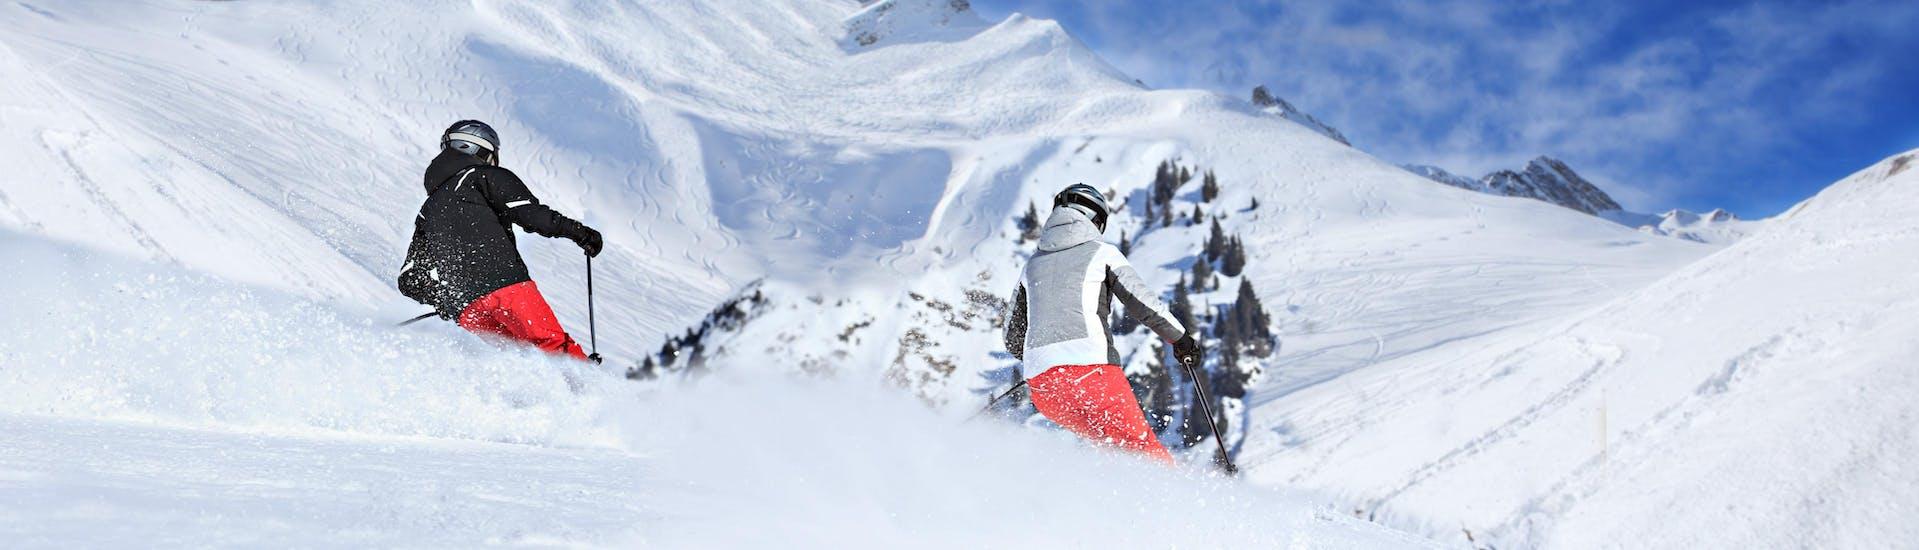 Two skiers are skiing through fresh powder snow on Arlberg, where local ski schools take aspiring skiers for their ski lessons.